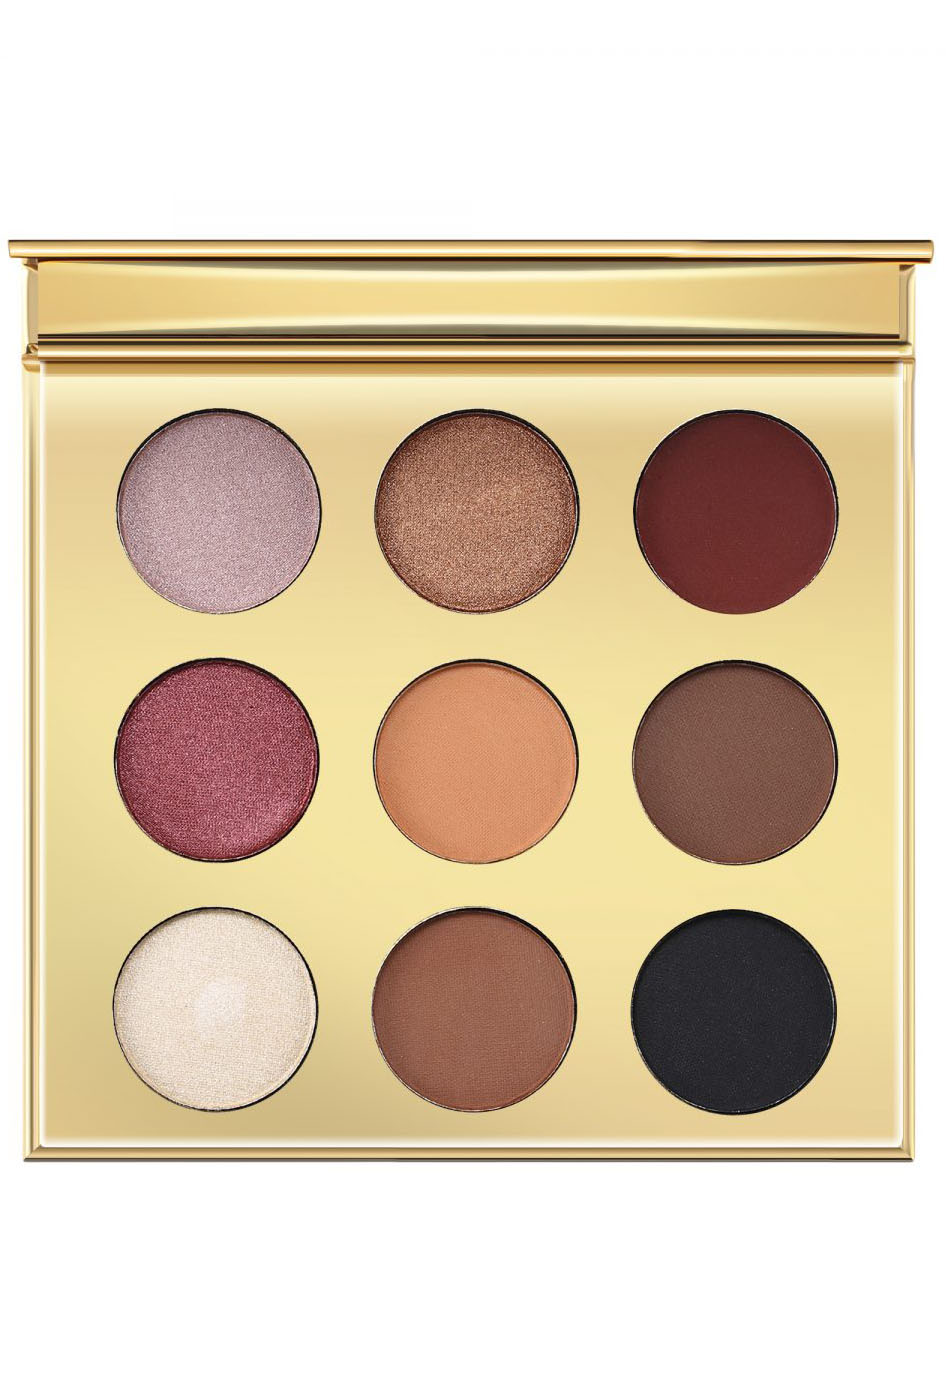 Paleta Farduri Lurella Cosmetics 9 Colors Eyeshadow Palette